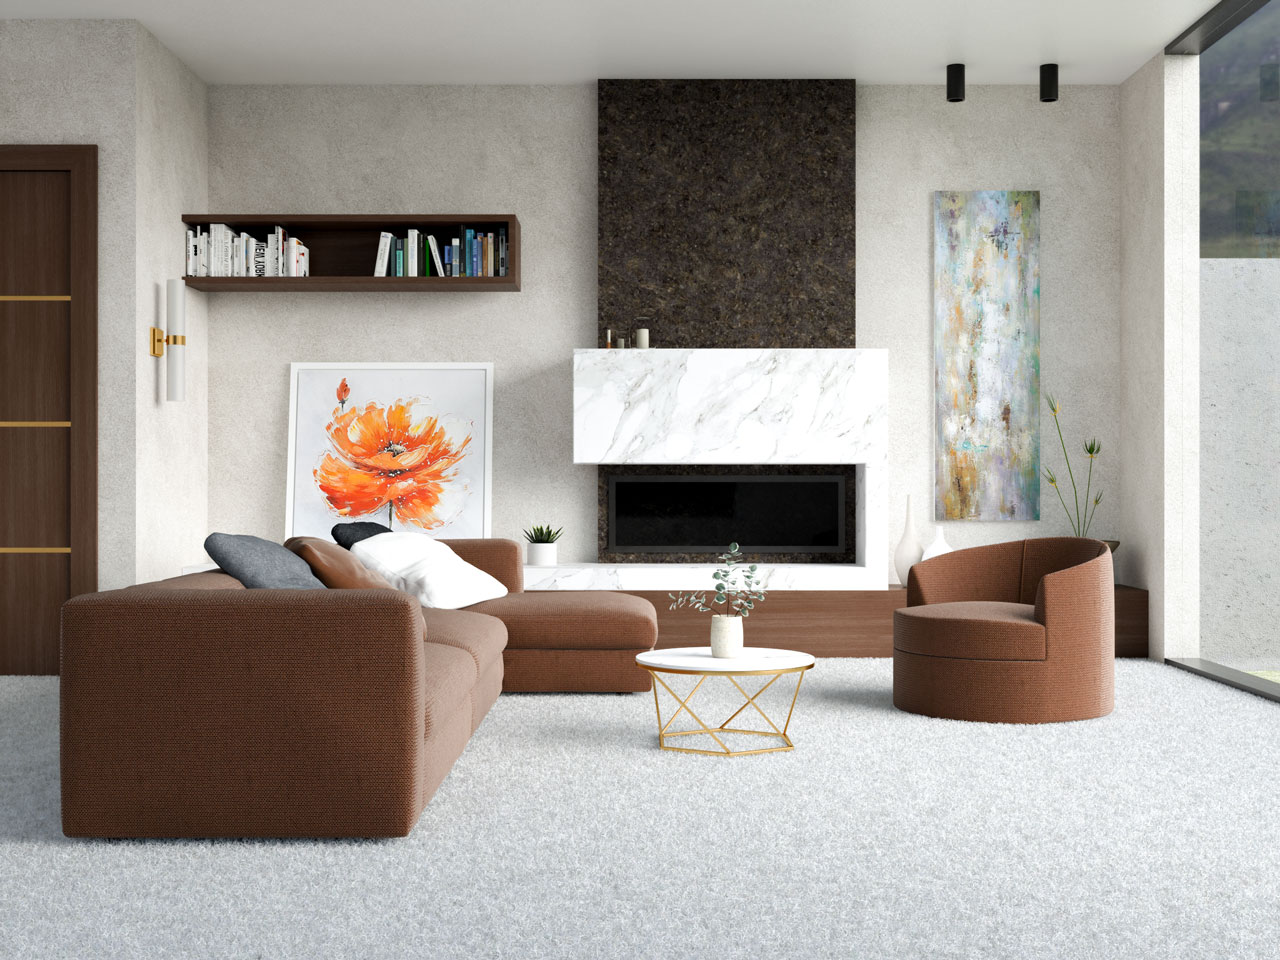 White carpet flooring with brown furnishings